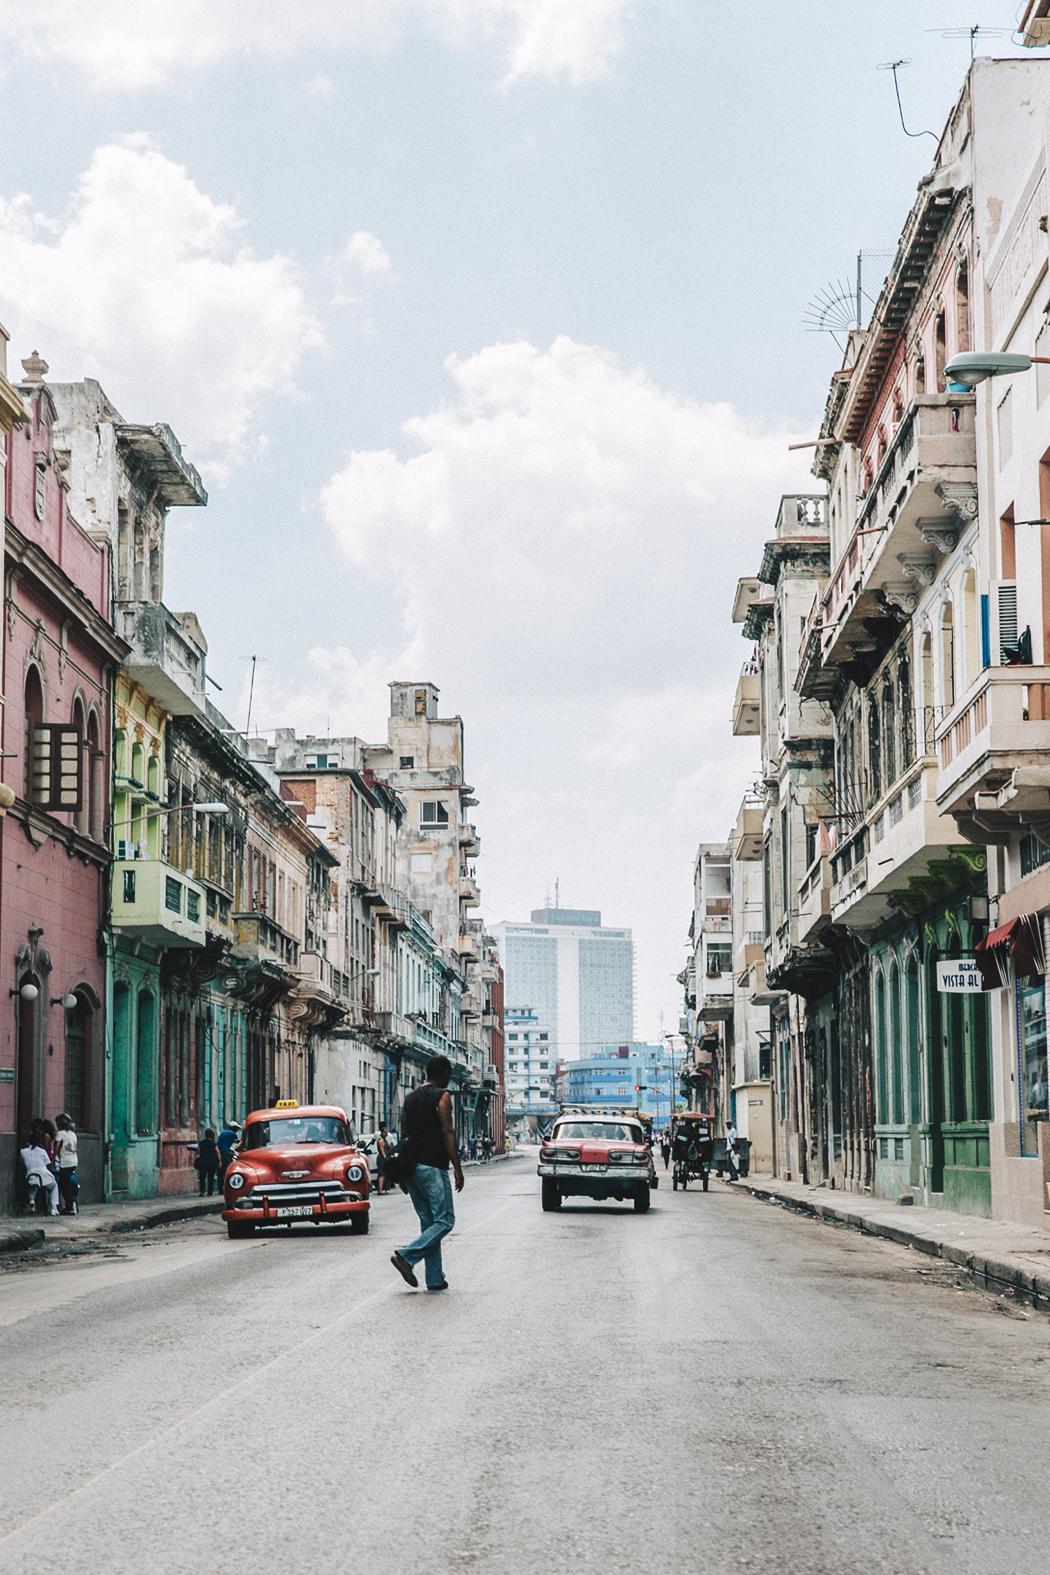 La_Habana-Cuba-Collage_On_The_Road-Fresa_Y_Chocolate-La_Guarida-Mint_Dress-Revolve_Clothing-Espadrilles-Outfit-Collage_Vintage-29